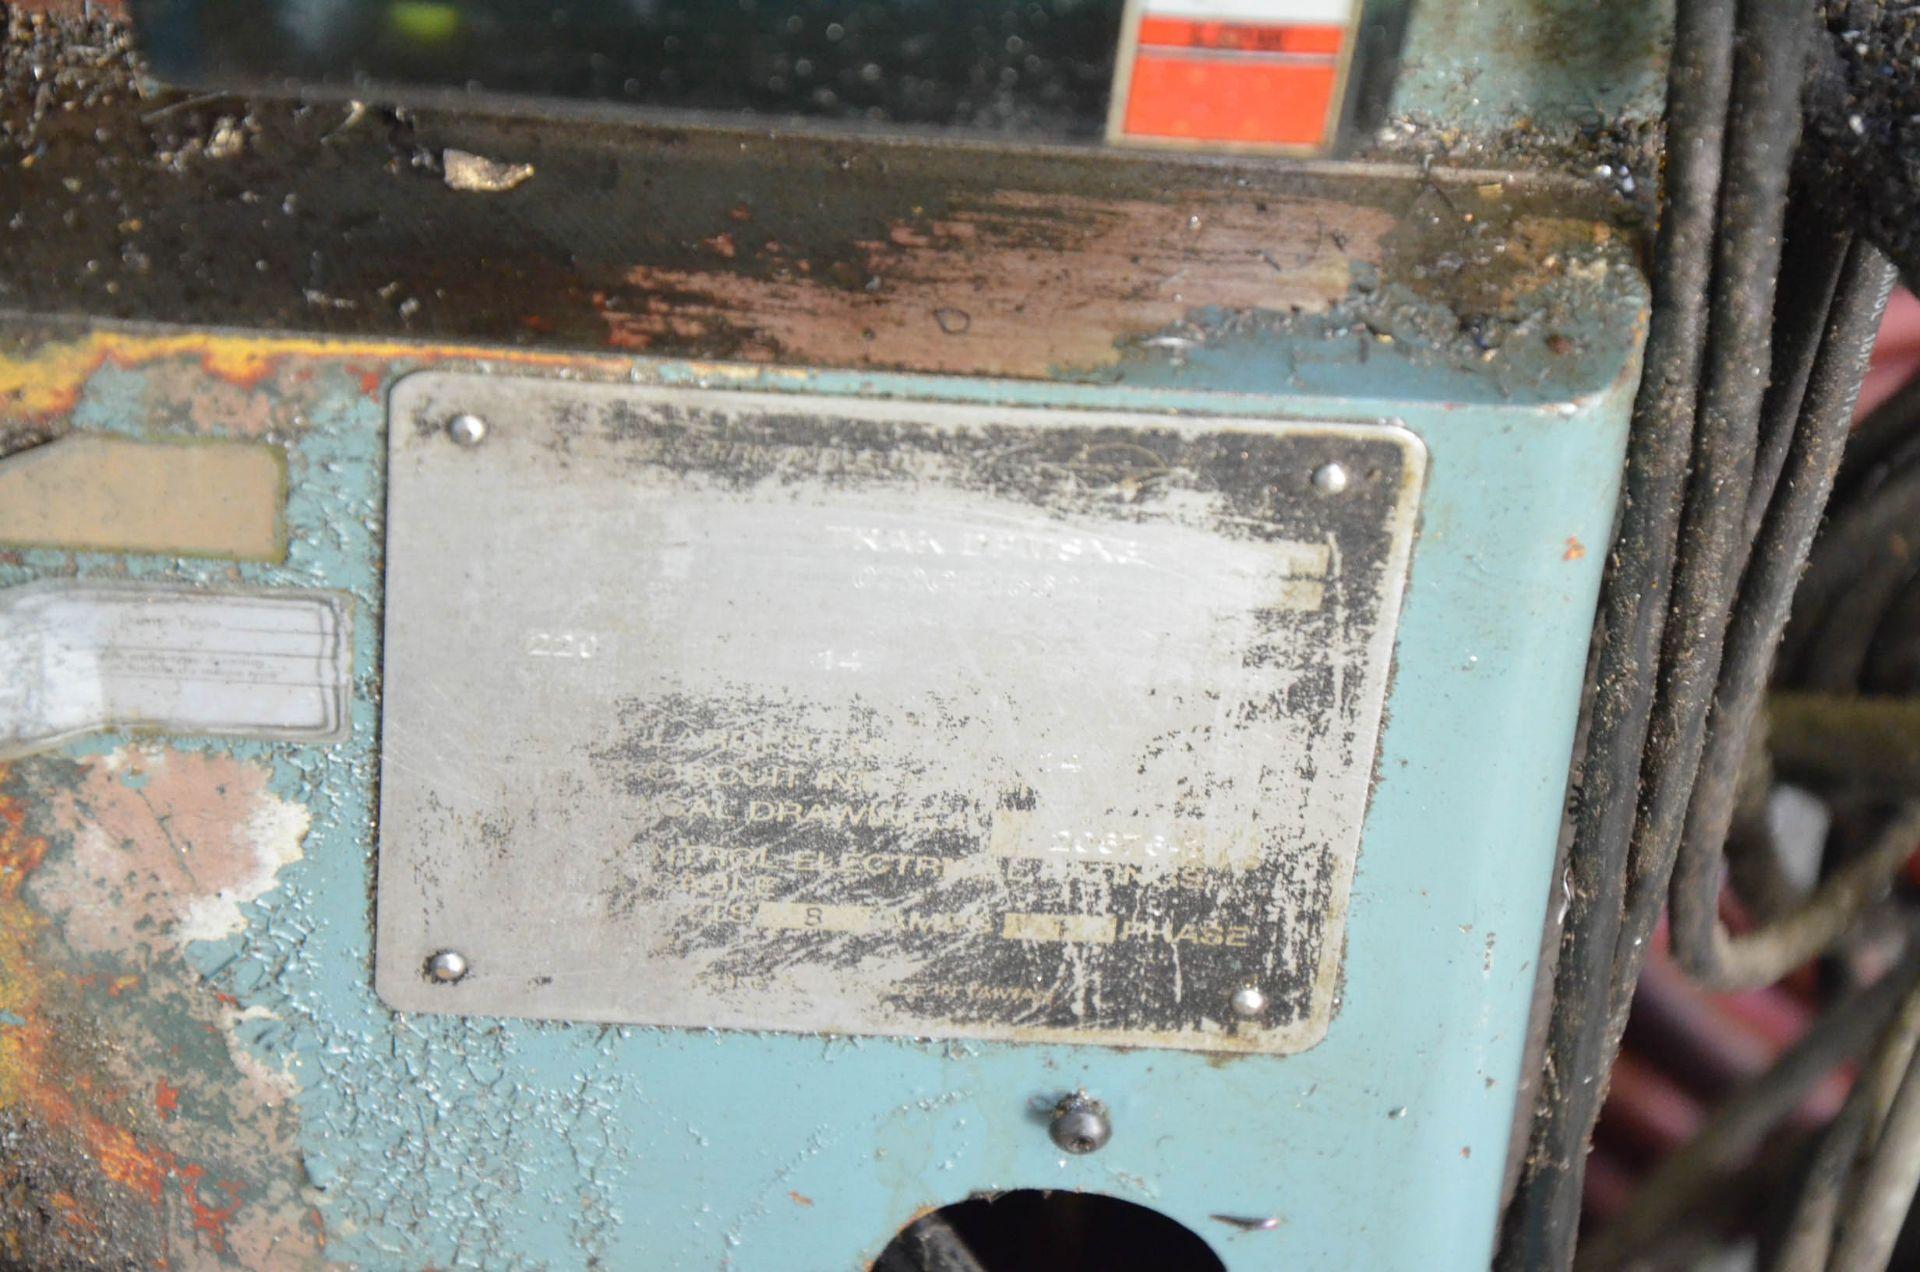 "TRAK DPM3 CNC VERTICAL TURRET MILLING MACHINE WITH PROTO TRAK (2007) SMX CNC CONTROL, 10"" X 50"" - Image 6 of 7"